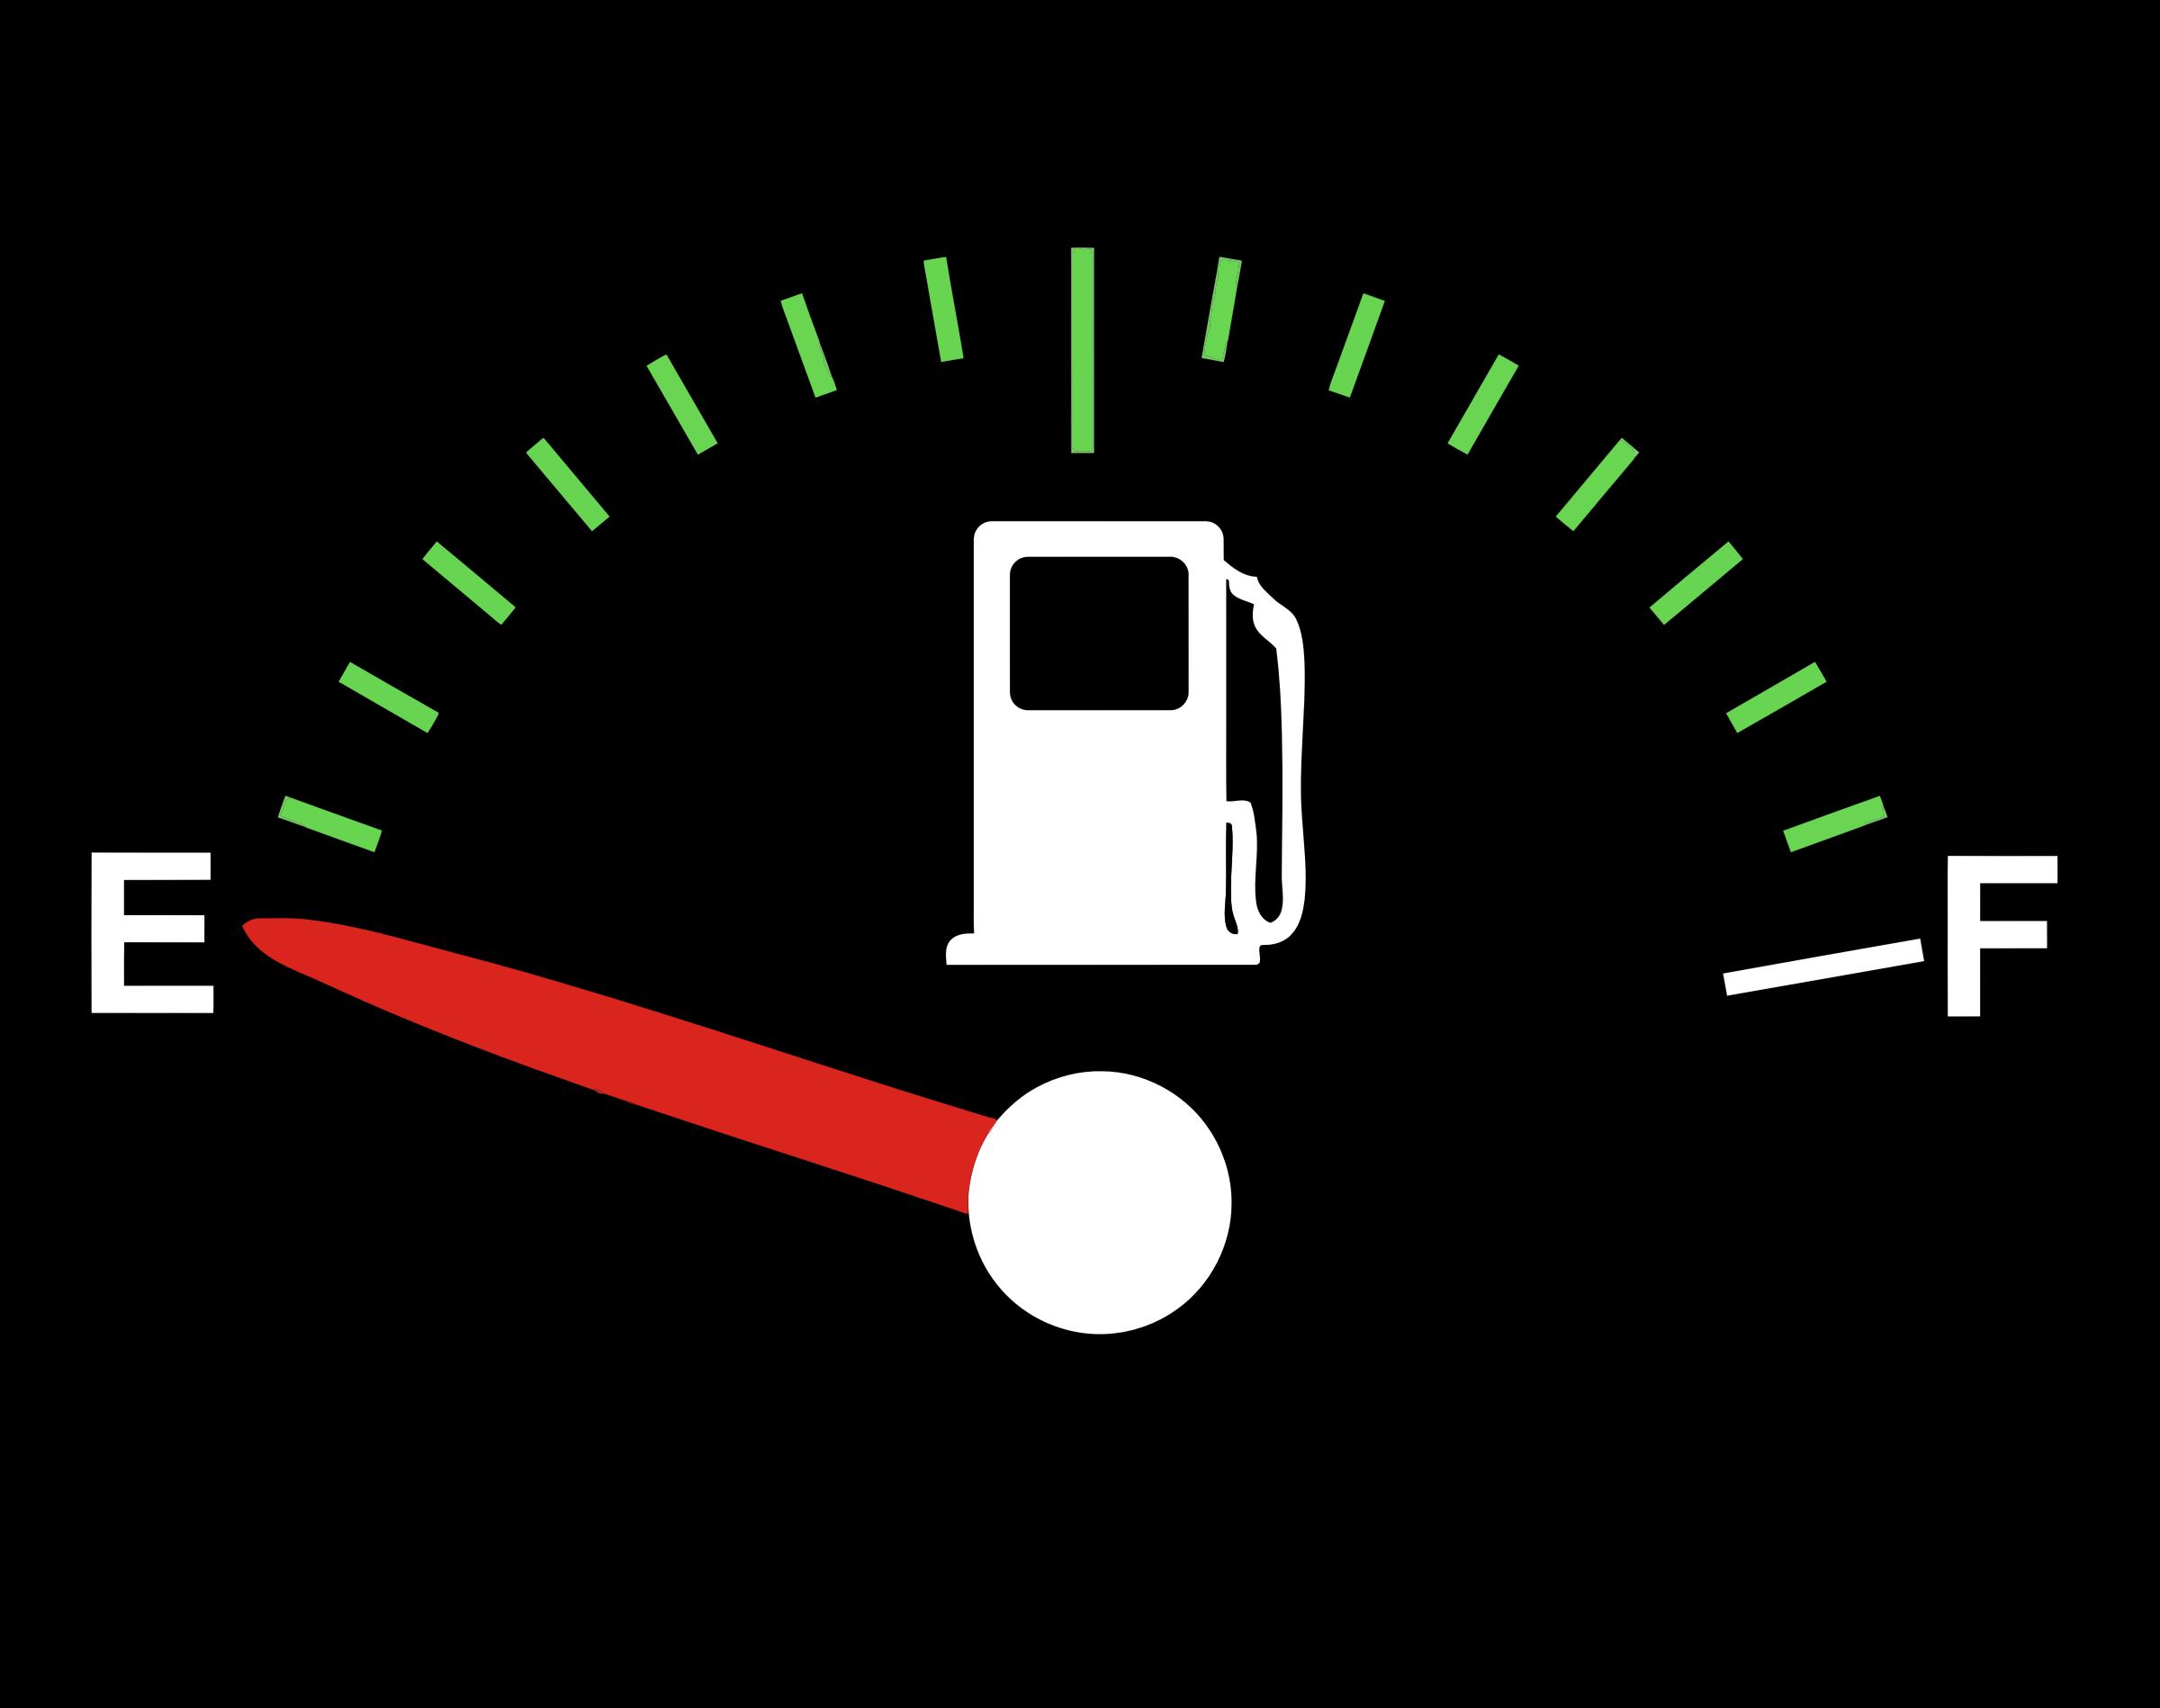 BIG IMAGE (PNG) - Fuel Gauge PNG